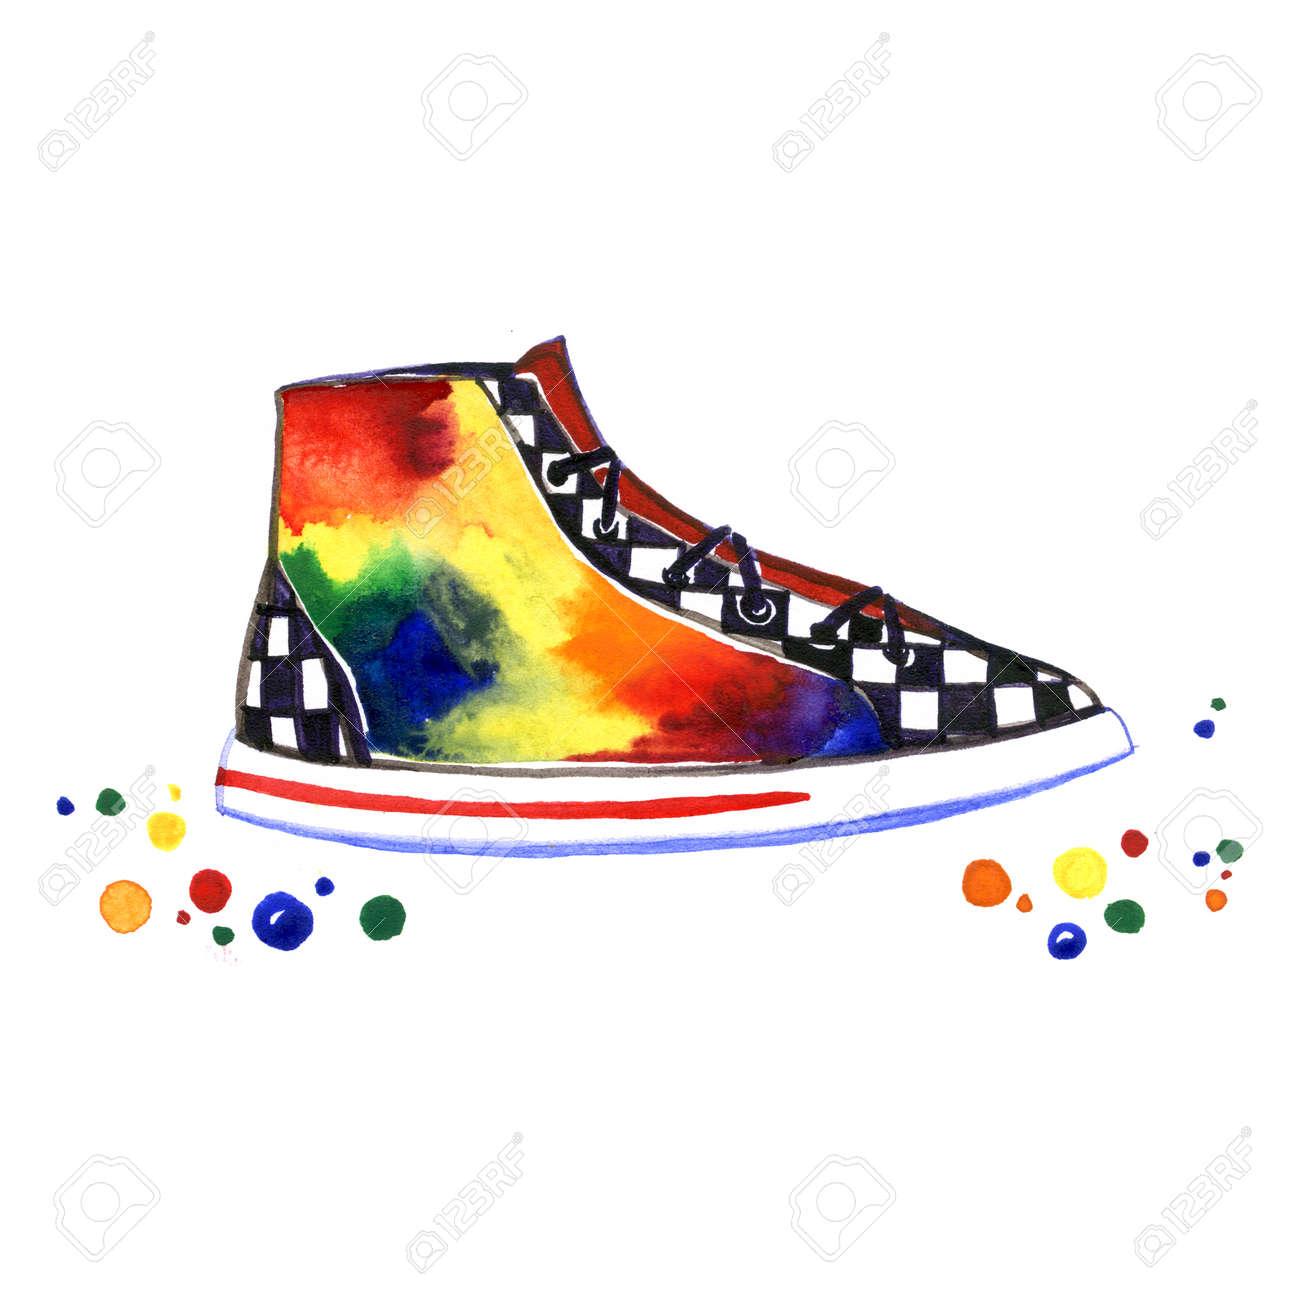 85a753432defed Irmgard Rutzenhöfer Kleiderkreisel Schuhe Schöne Kleiderkreisel Schuhe  Kleiderkreisel Schuhe Schöne Schöne Schöne Schuhe Schuhe Schöne  Kleiderkreisel qYAwXY